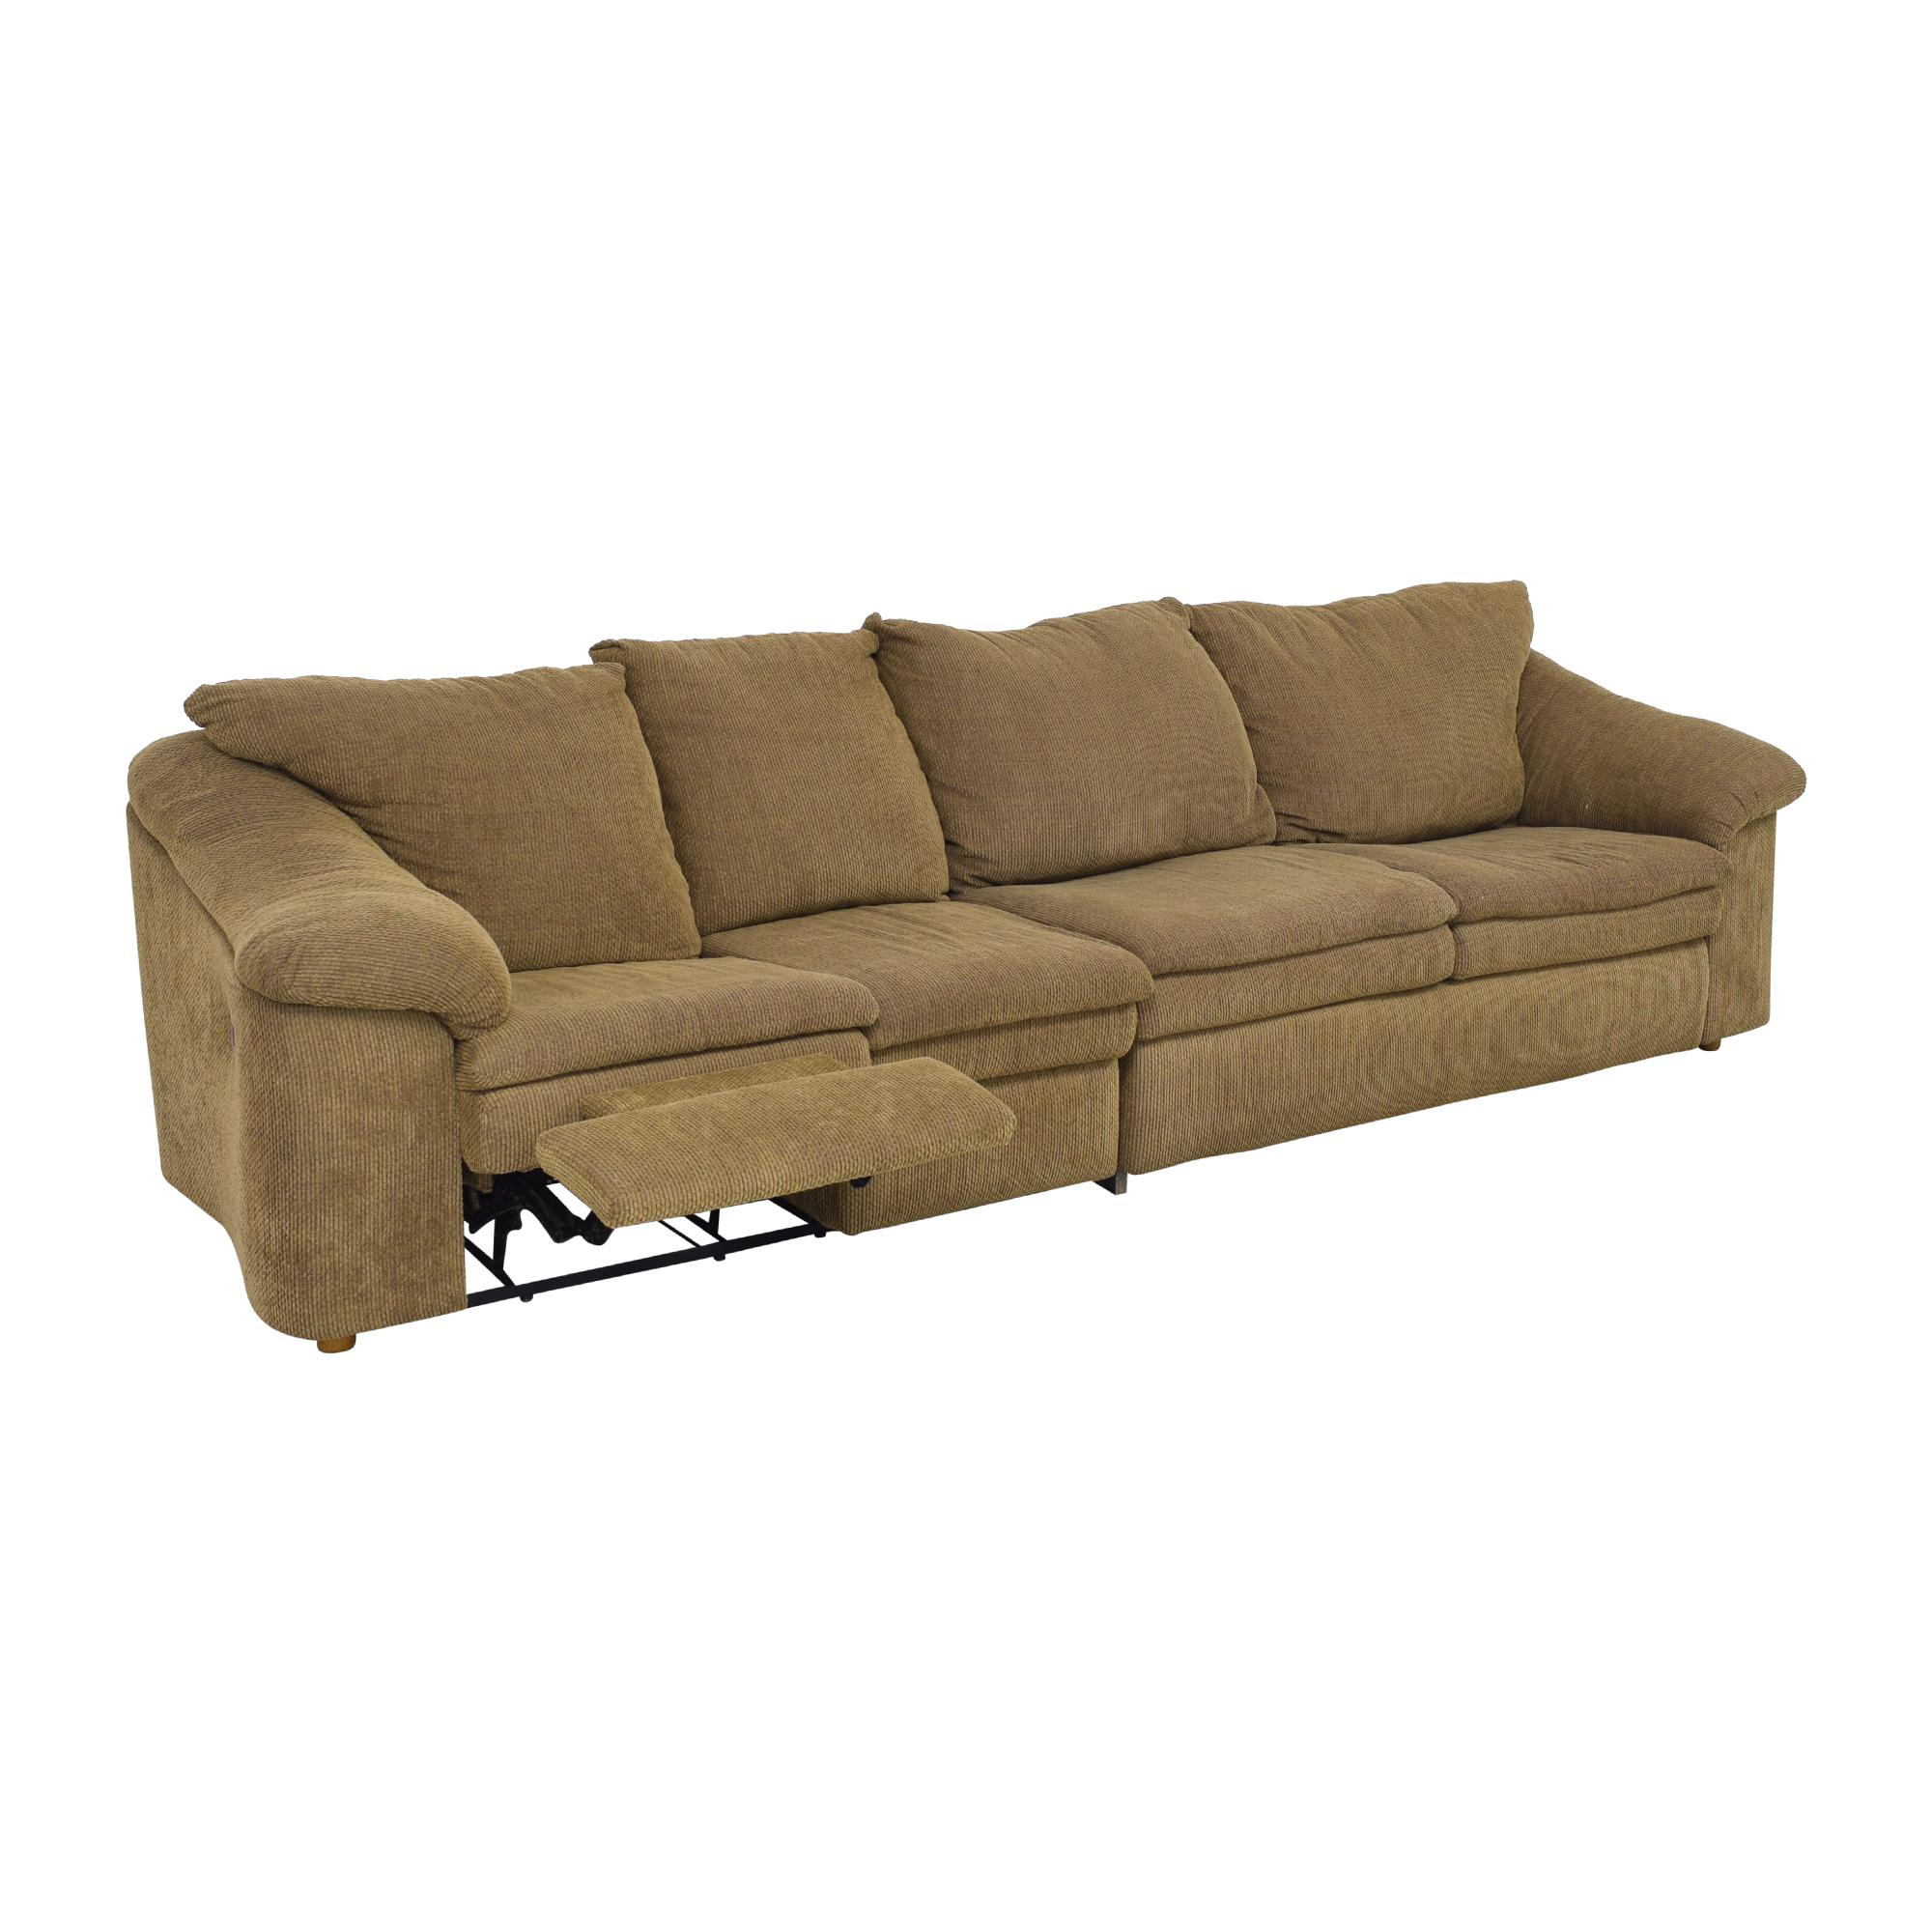 Raymour & Flanigan Raymour & Flanigan Sleeper Sofa with Ottoman brown